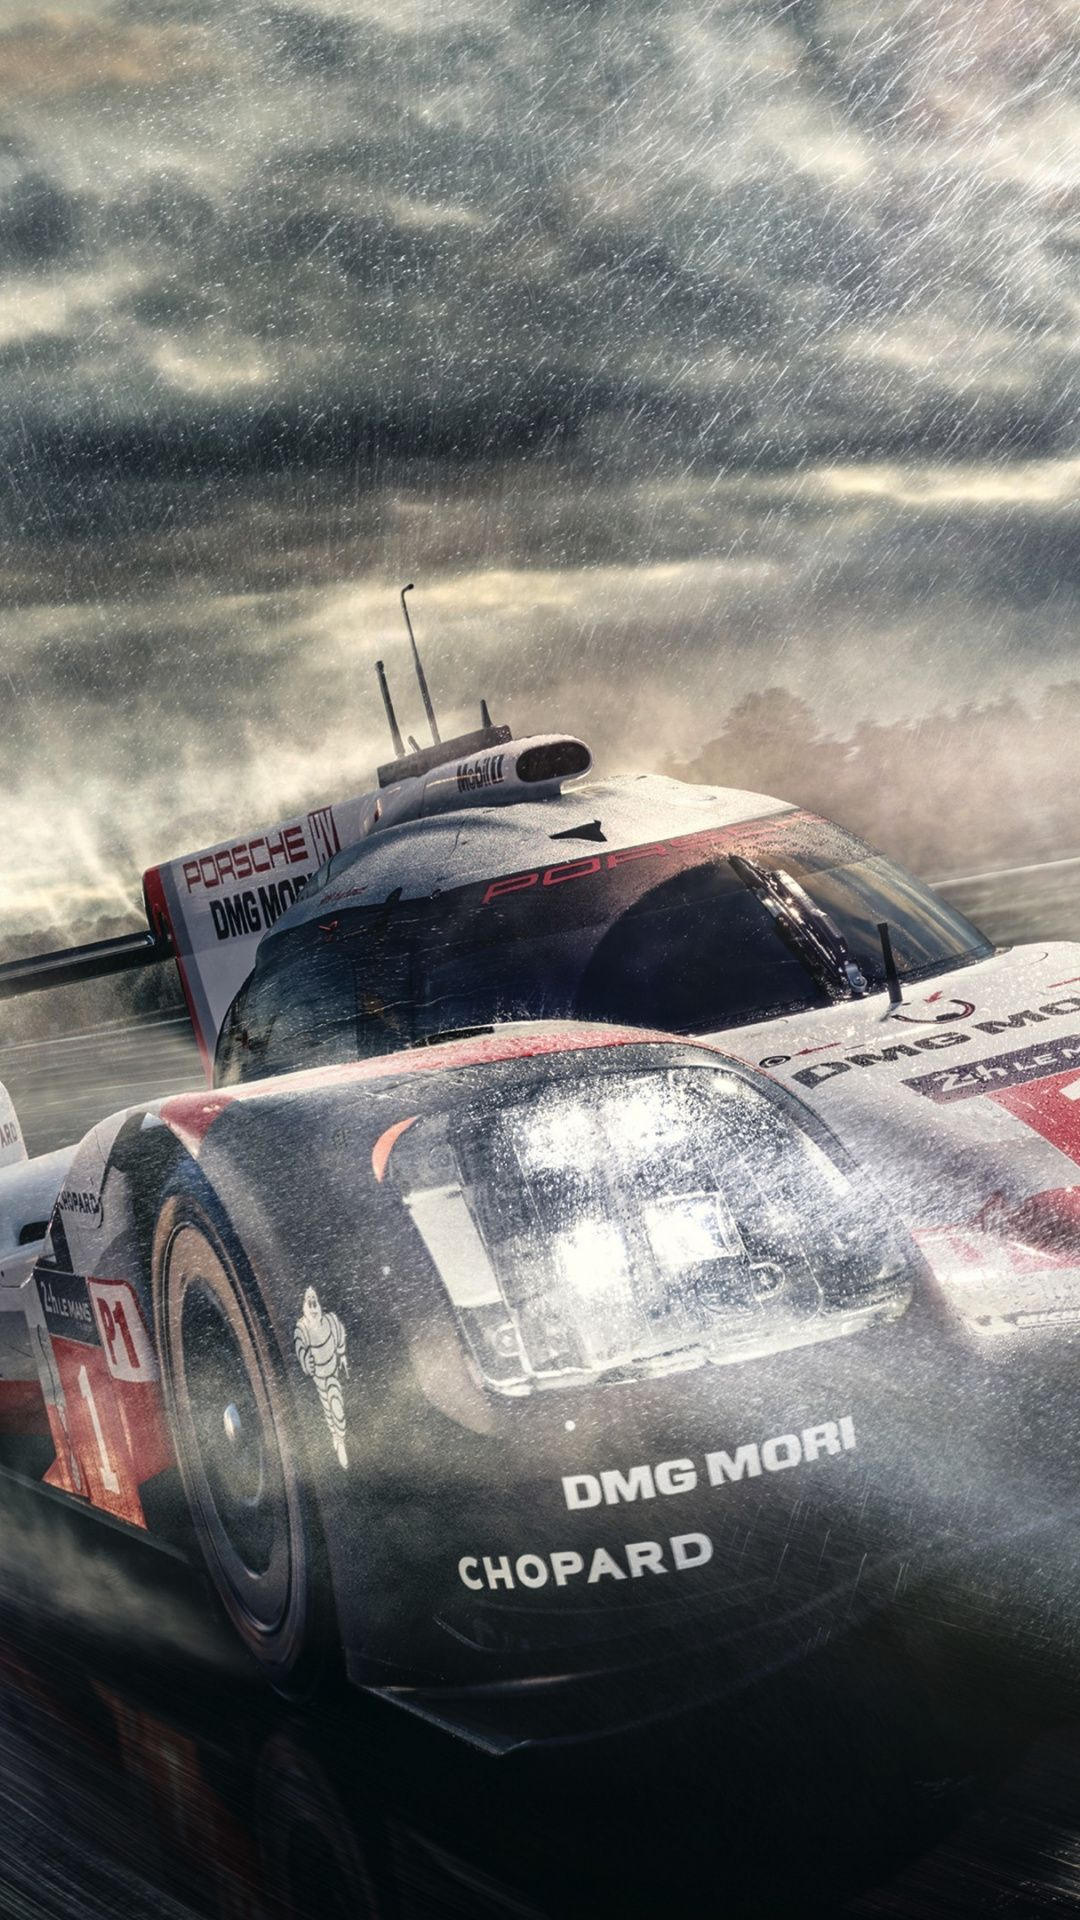 Downaload Porsche 919 Hybrid, Formula One, Sports Car Wallpaper, 1080x1920,  Samsung Galaxy